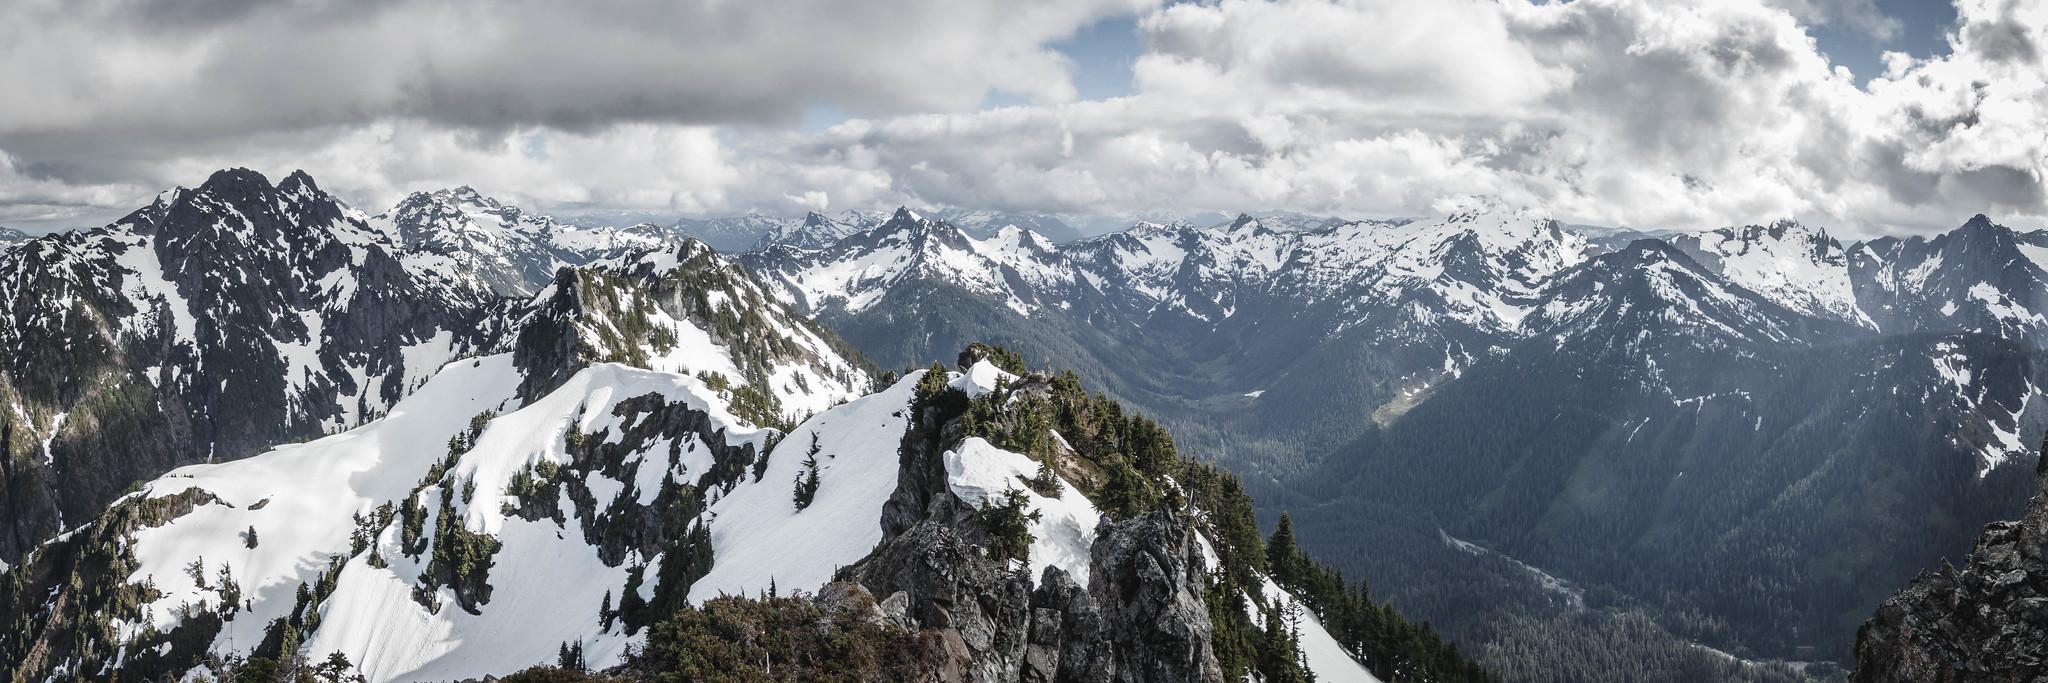 Gemini Peaks to Big Four Mountain panoramic view